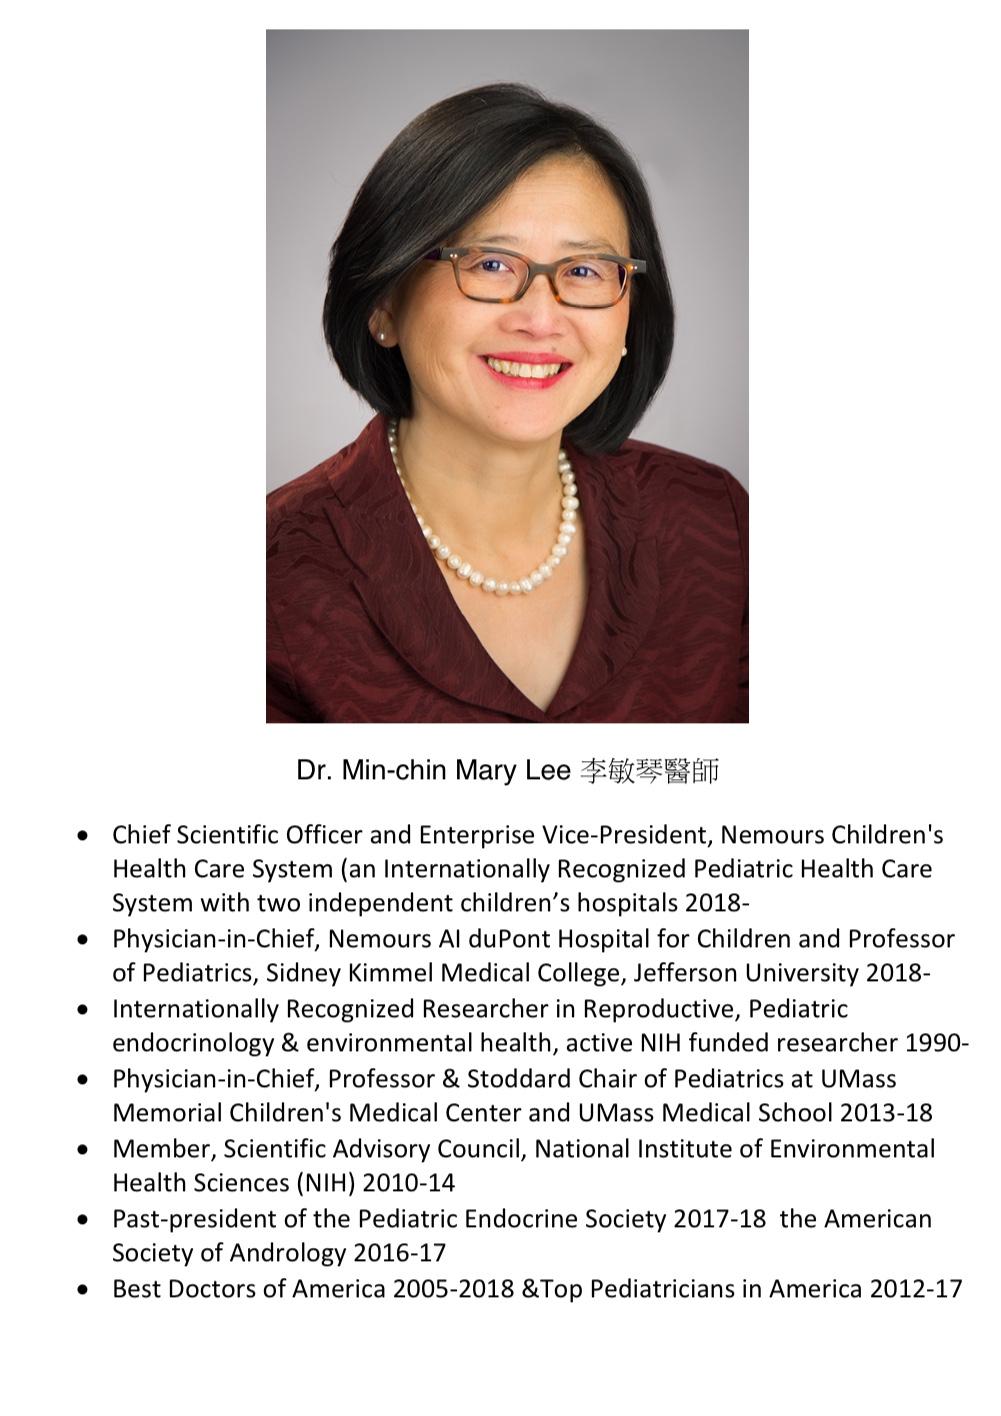 222. Dr. Min-chin Mary Lee 李敏琴醫師